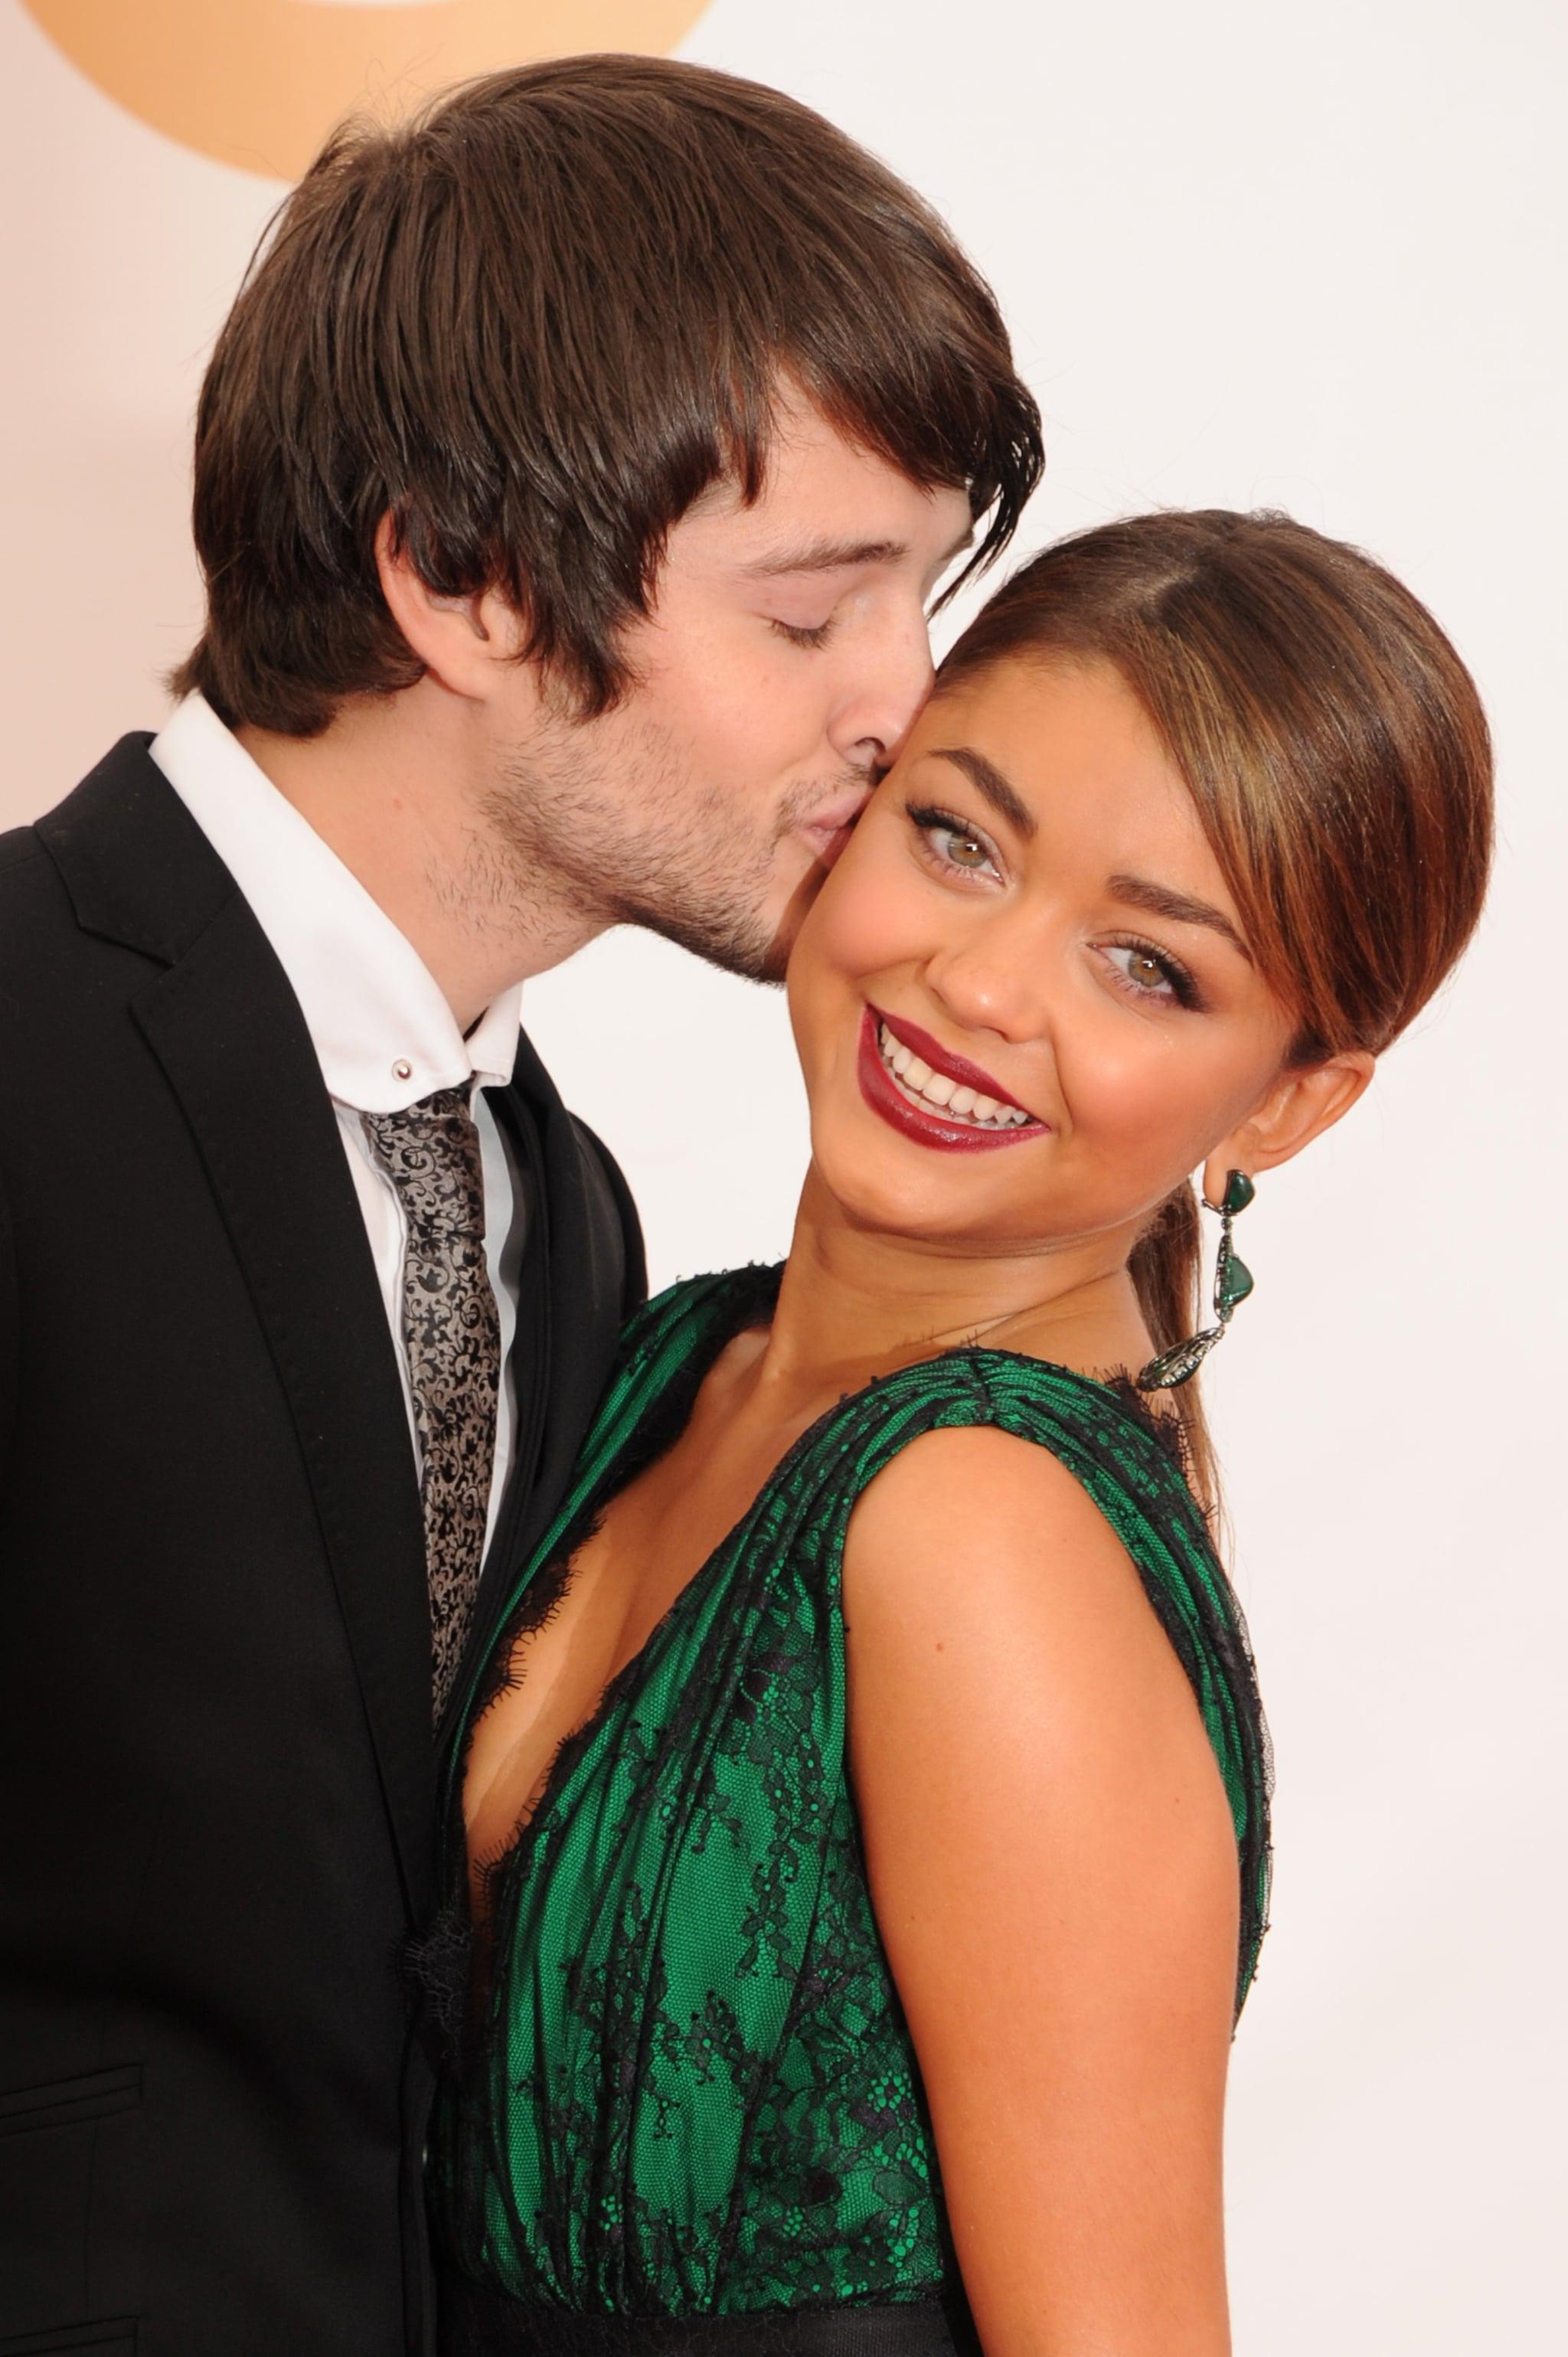 Sarah Hyland received a sweet kiss on the cheek from boyfriend Matt Prokop at the Emmy Awards.